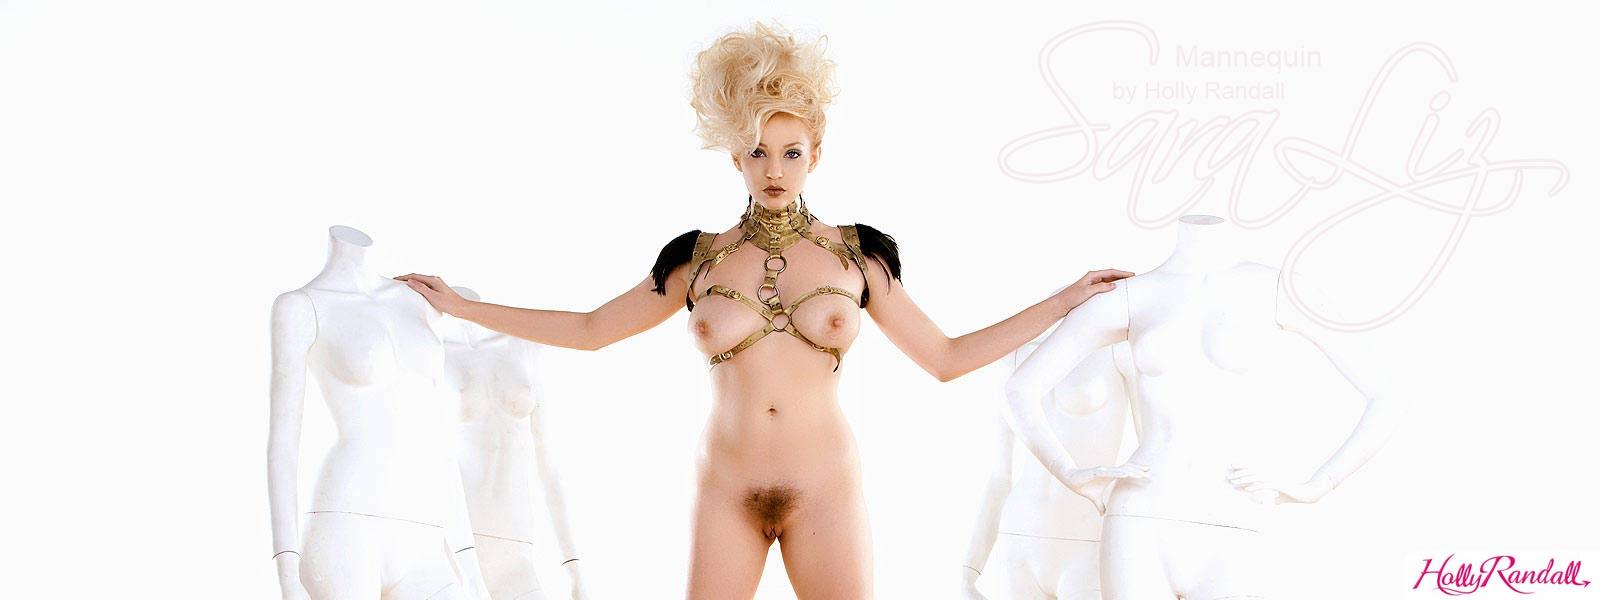 Iveta Sunshaded saraliz in mannequin